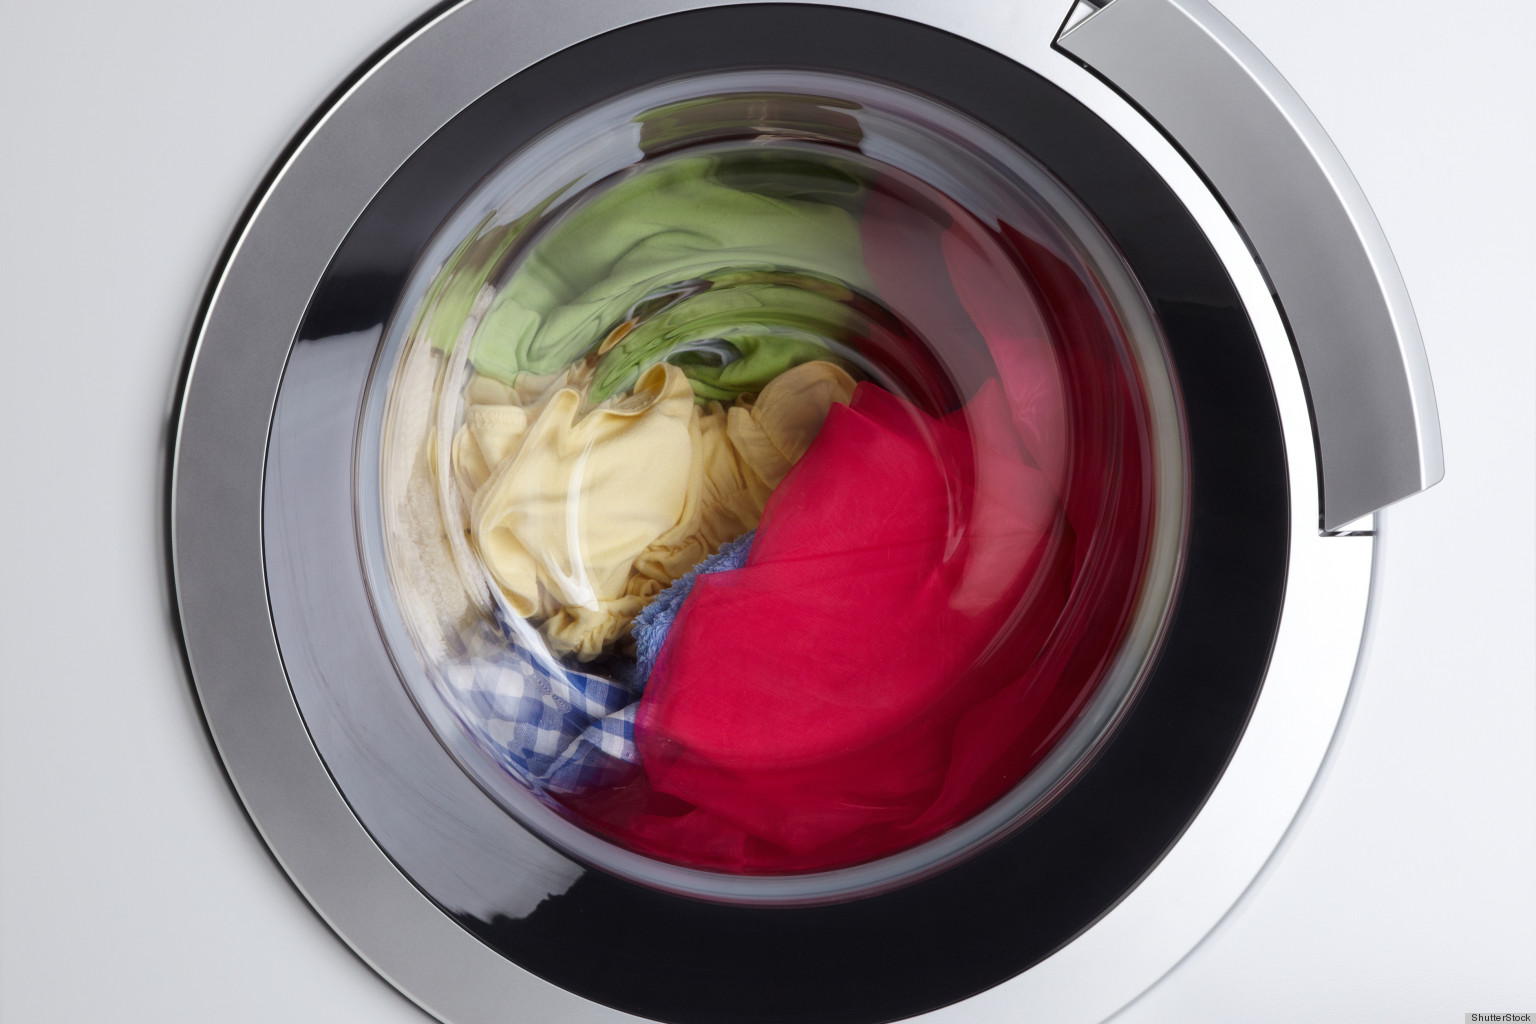 lavatrice_posizione